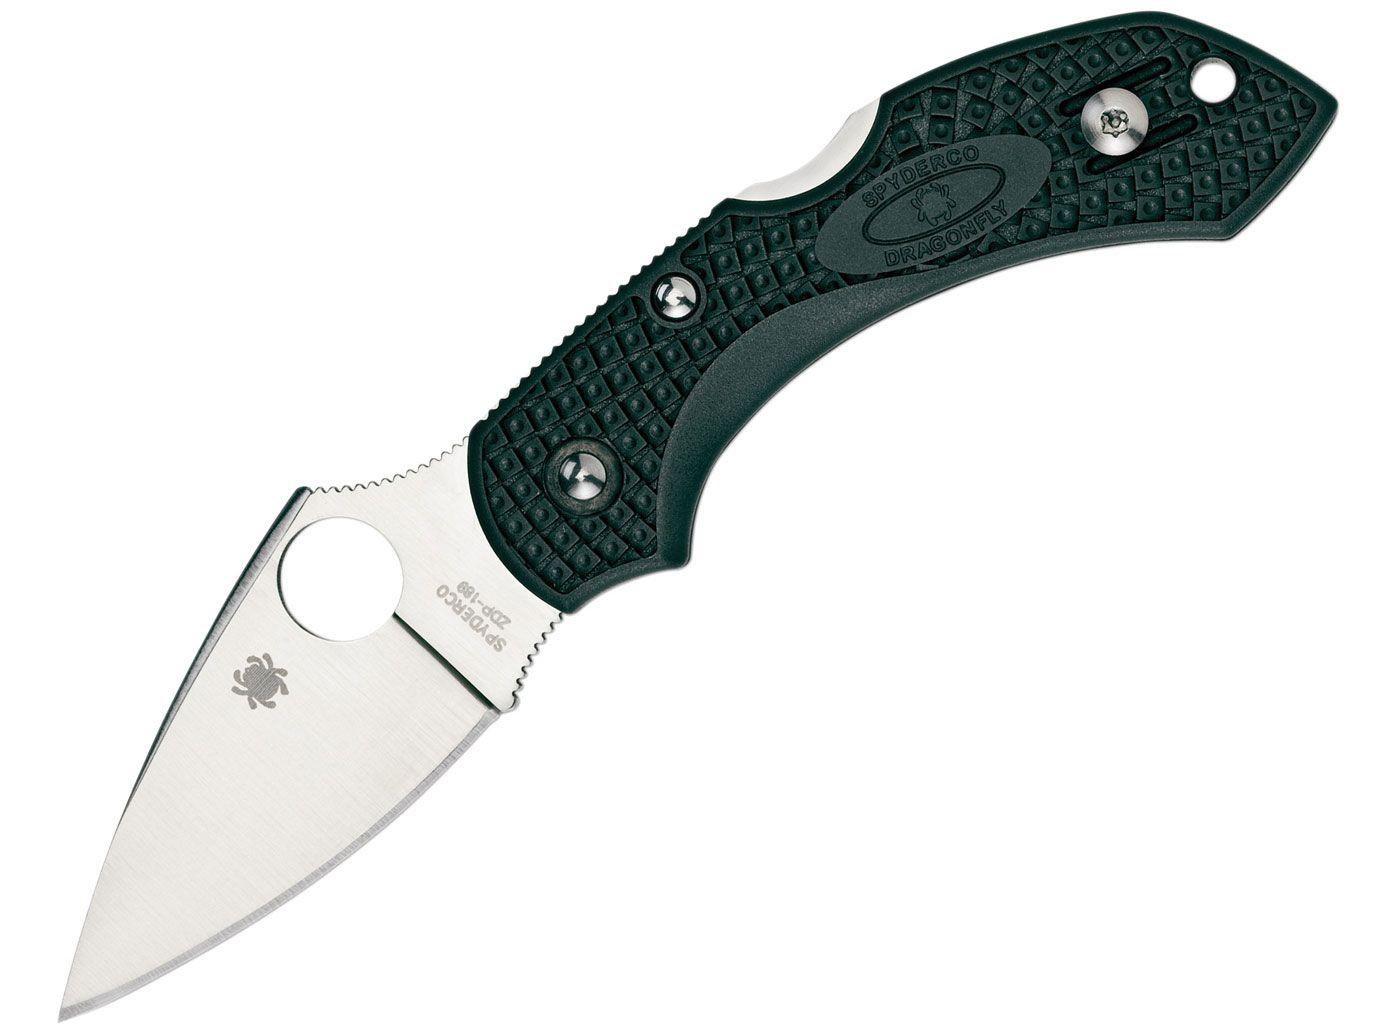 Spyderco Knives Dragonfly 2 Spear Point Knife